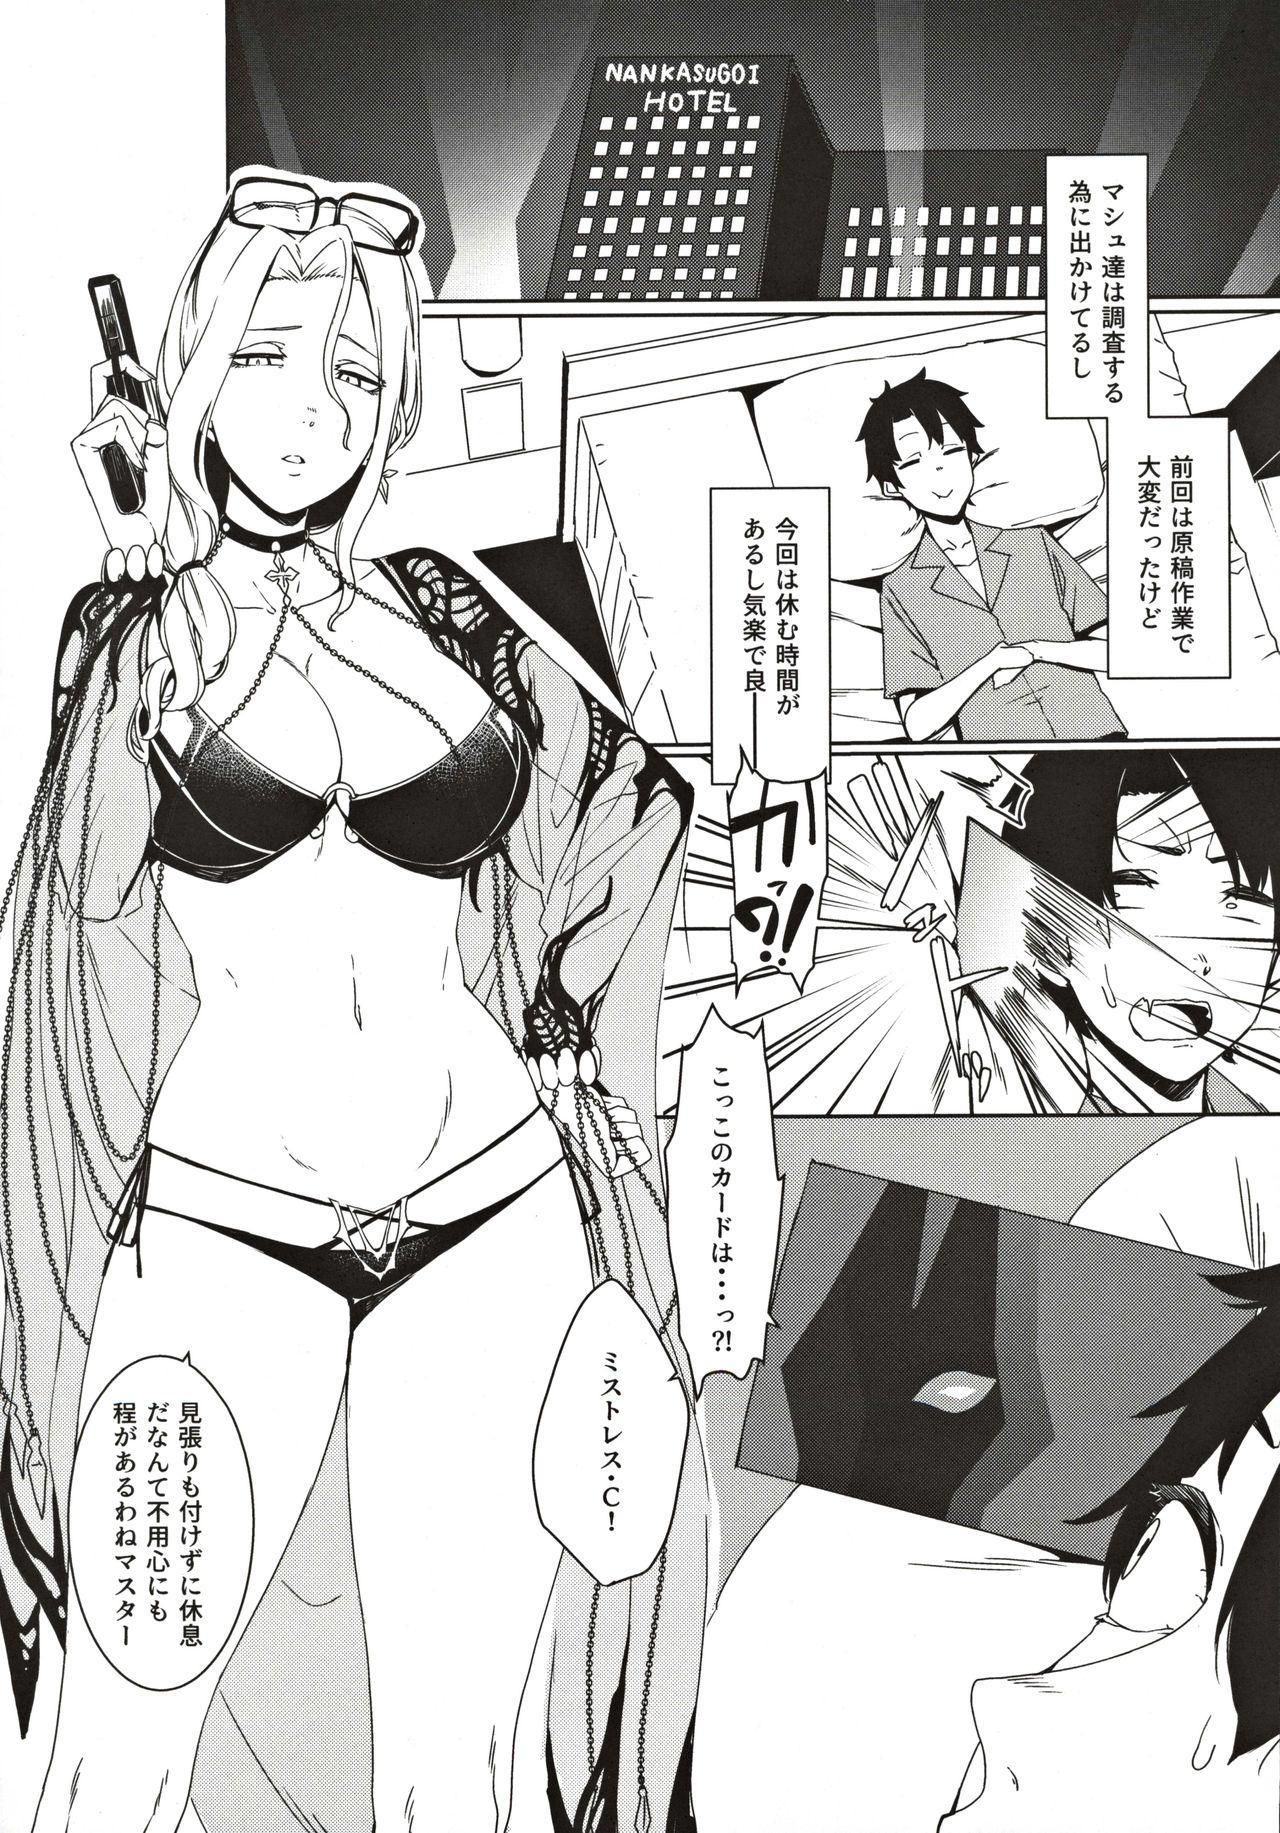 Carmilla-san no Ecchi na no ga Kakitakatta Hon 15